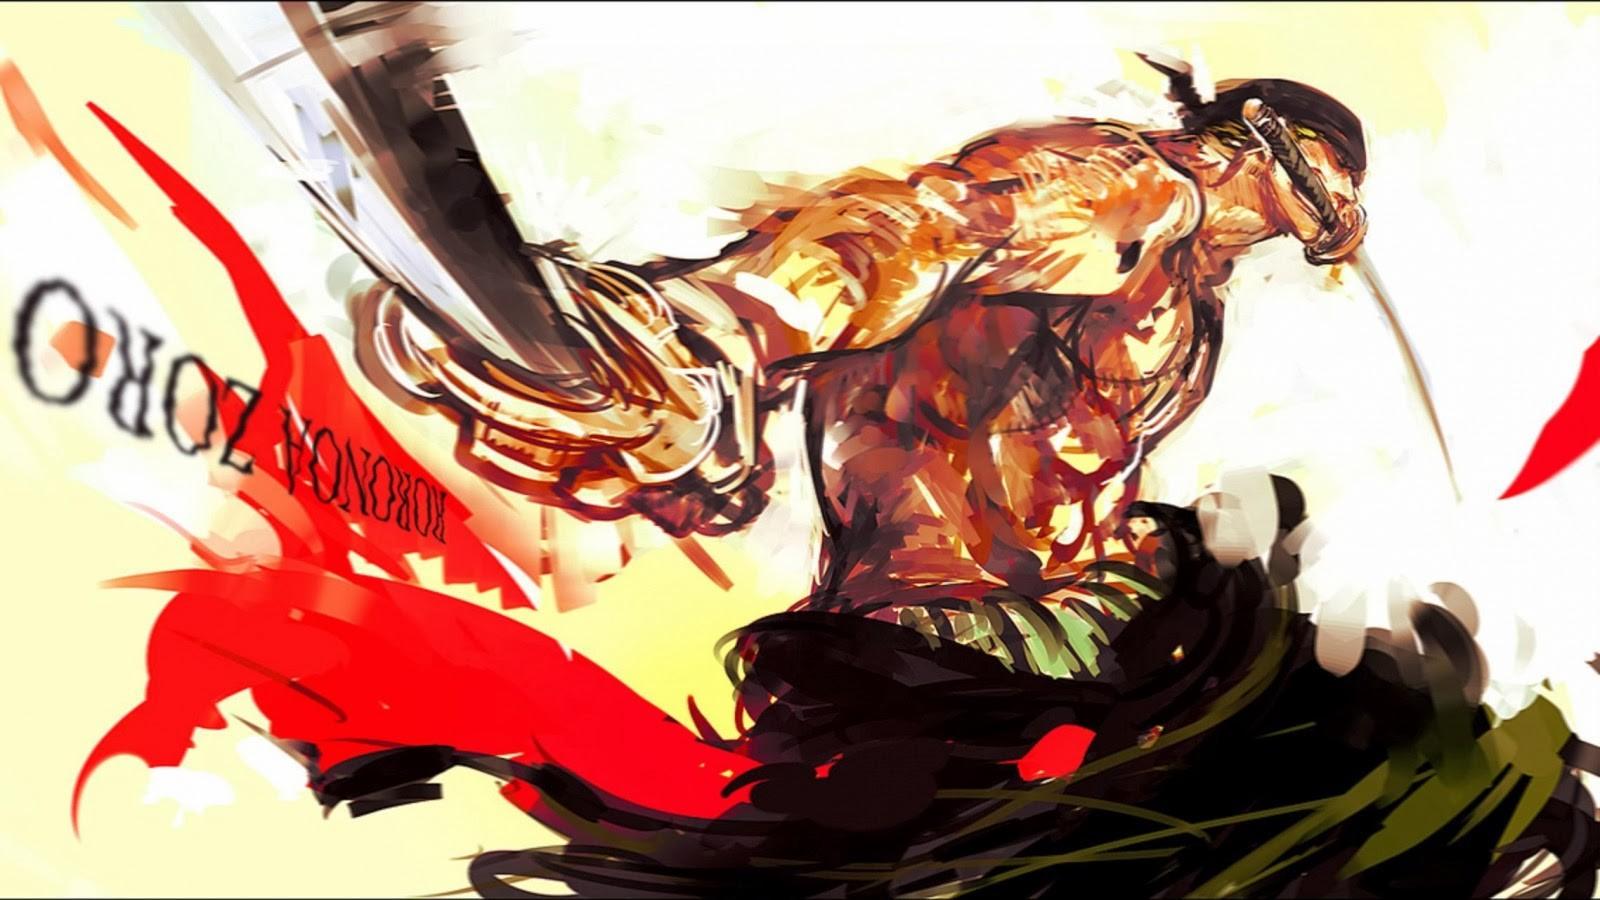 Wallpaper Illustration Anime One Piece Roronoa Zoro Fictional